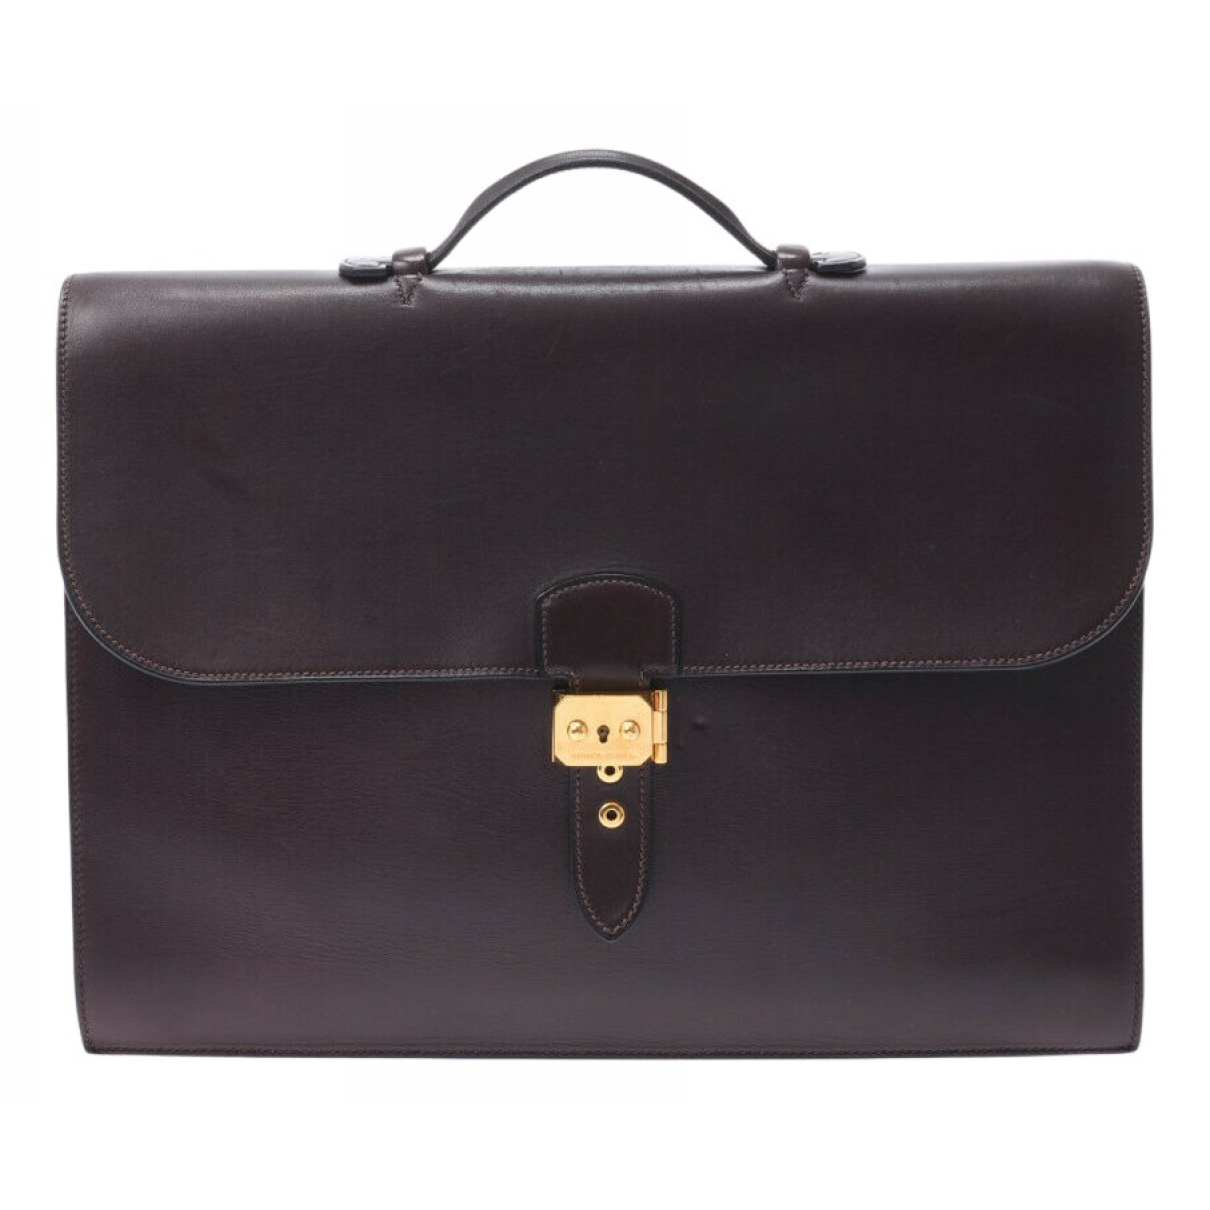 Hermès N Burgundy Leather handbag for Women N